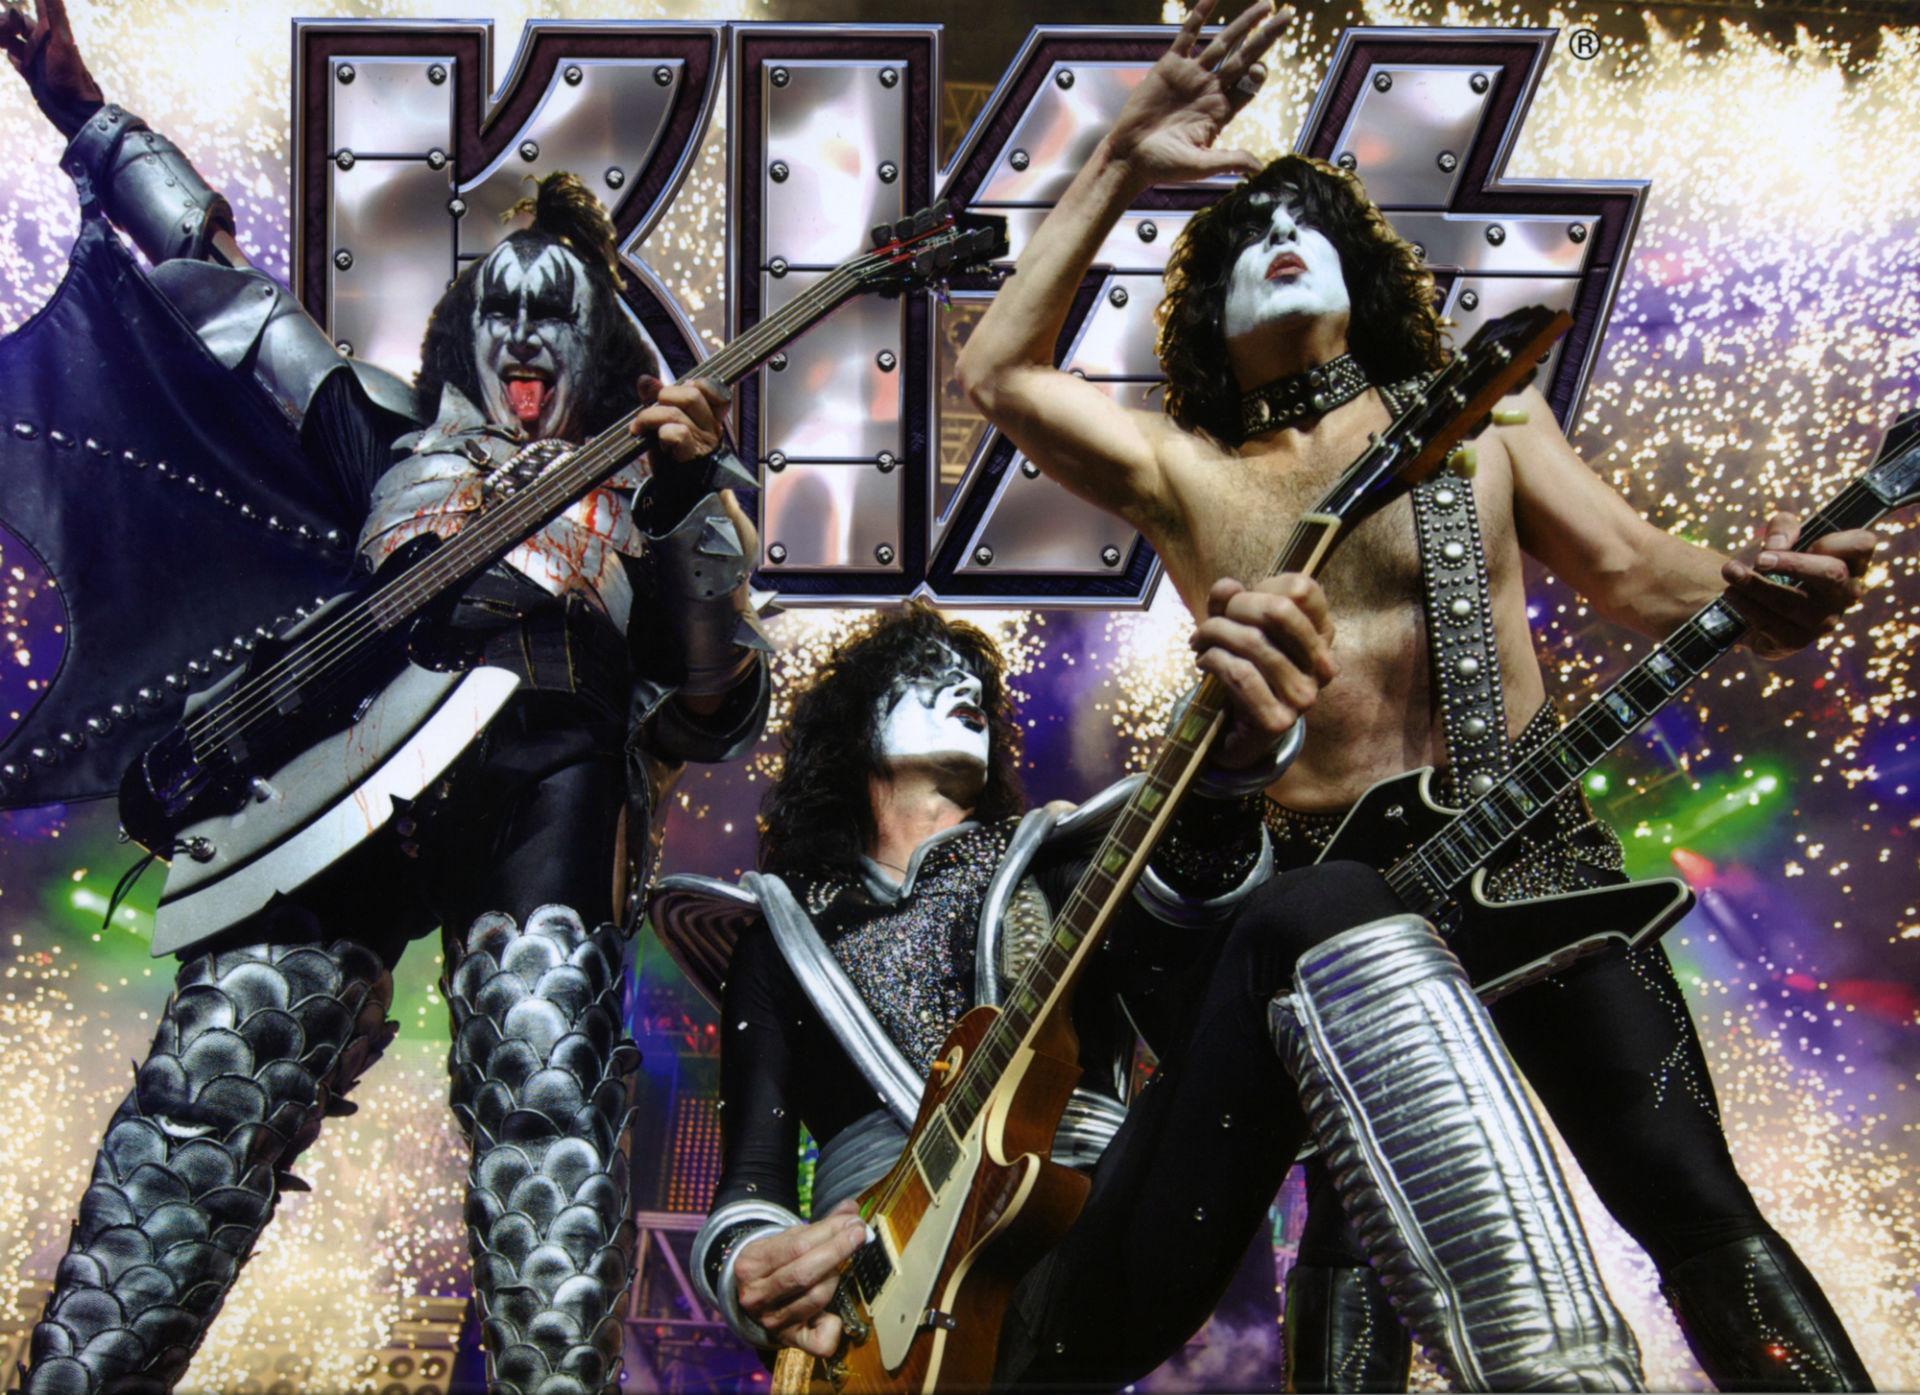 Kiss Band Cartoon Wallpaper Kiss Heavy Metal Rock Bands 1920x1395